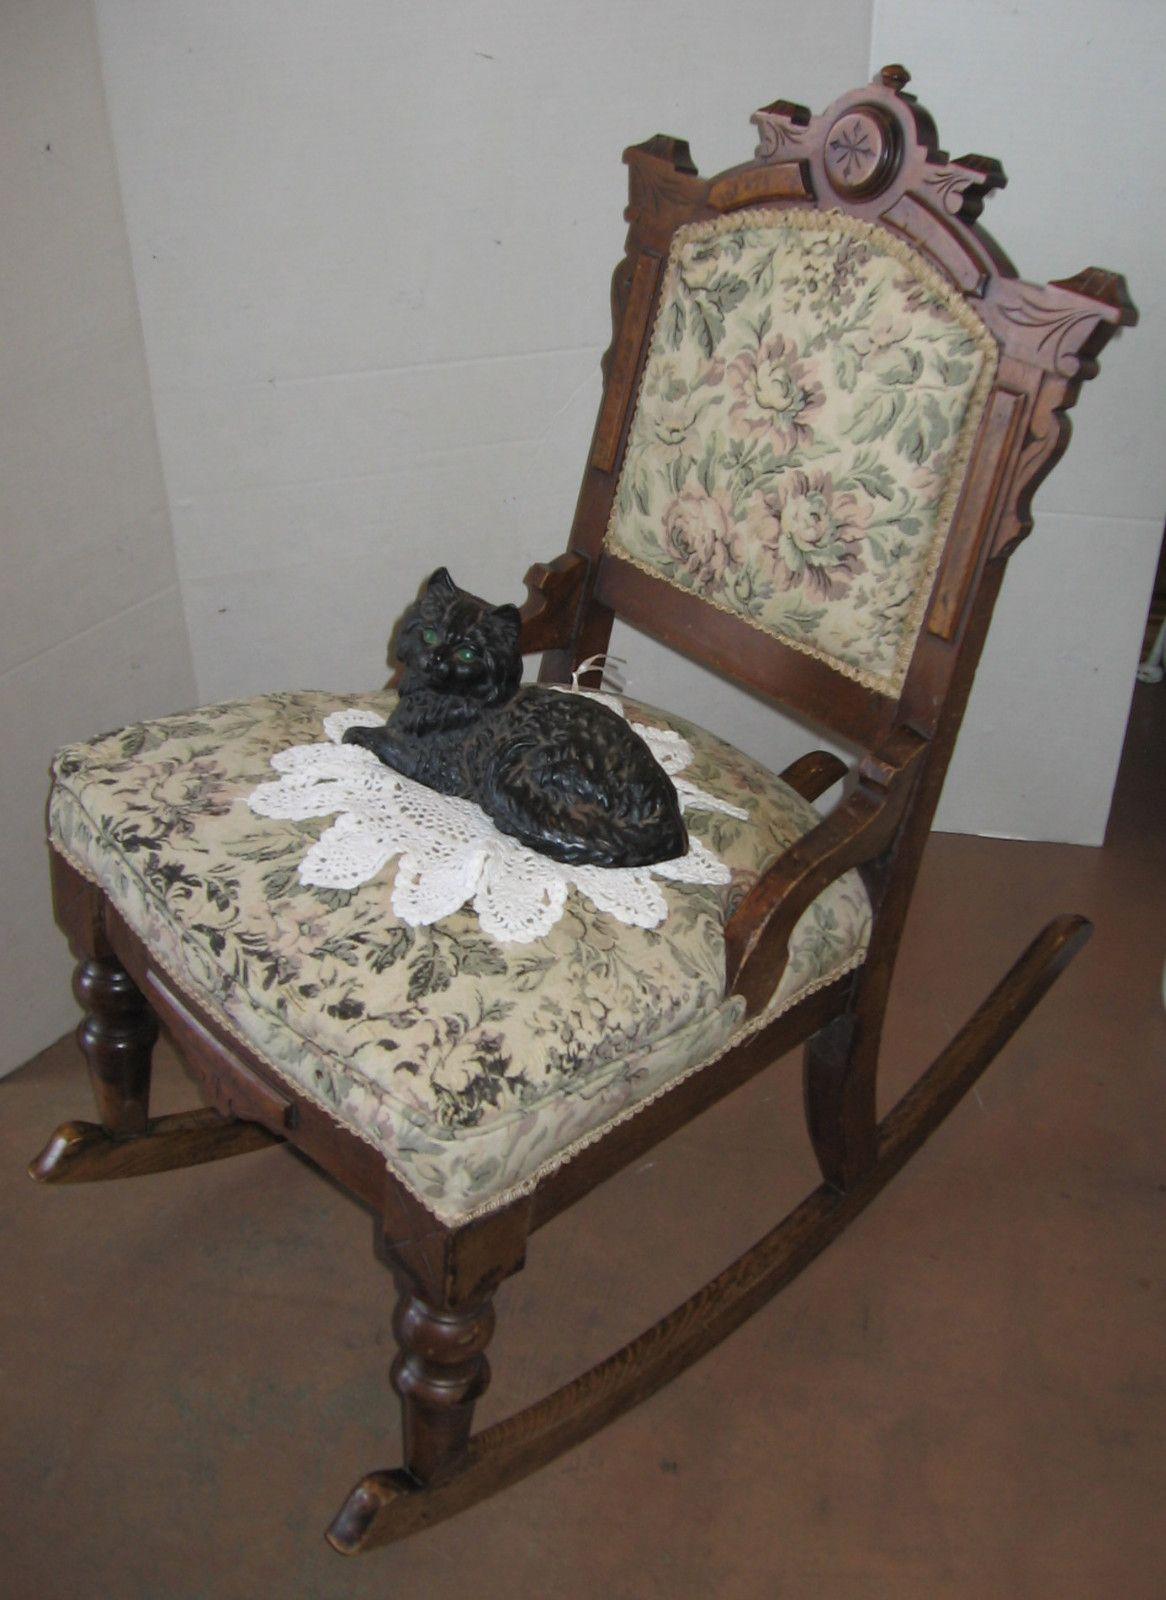 Petite antique Eastlake rocking chair, Victorian ladies' sewing or nursing  chair. - Petite Antique Eastlake Rocking Chair, Victorian Ladies' Sewing Or